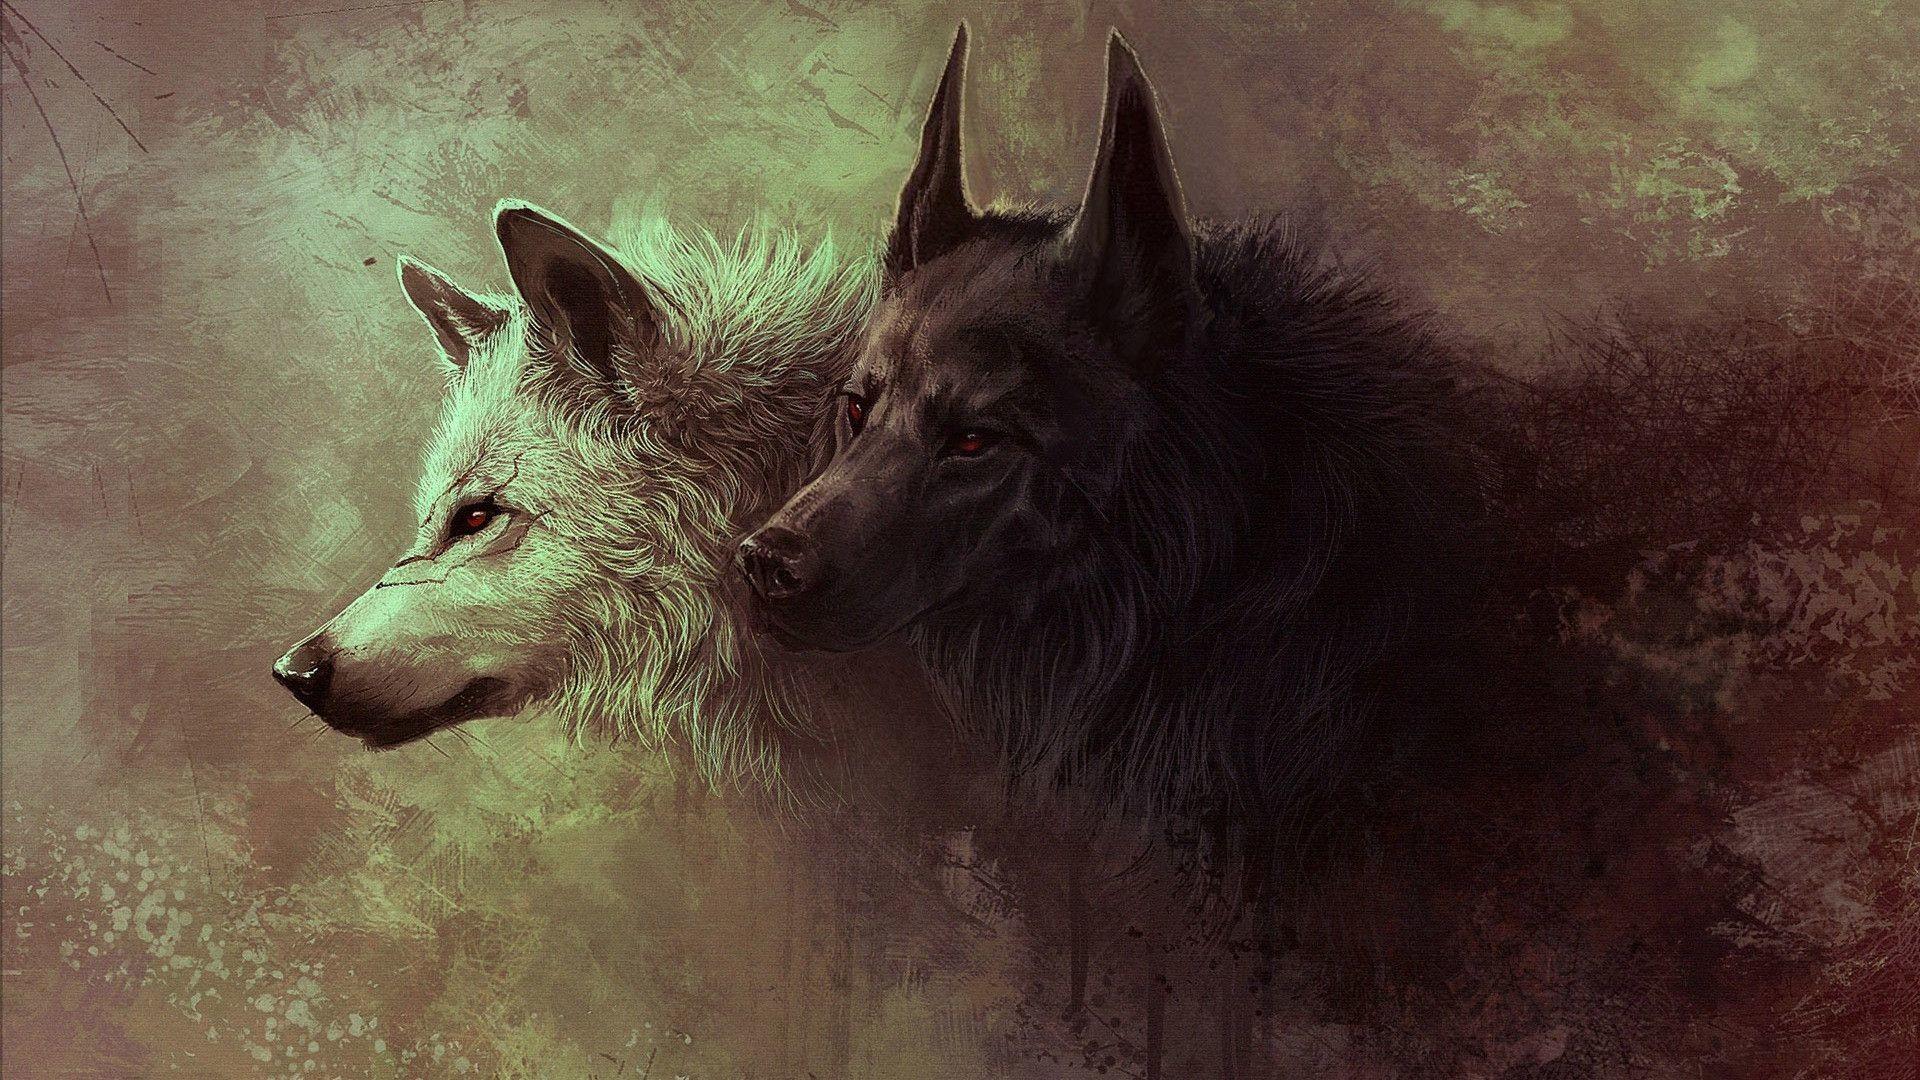 … animals wallpaper hd black wolf wallpaper full hd at bozhuwallpaper …